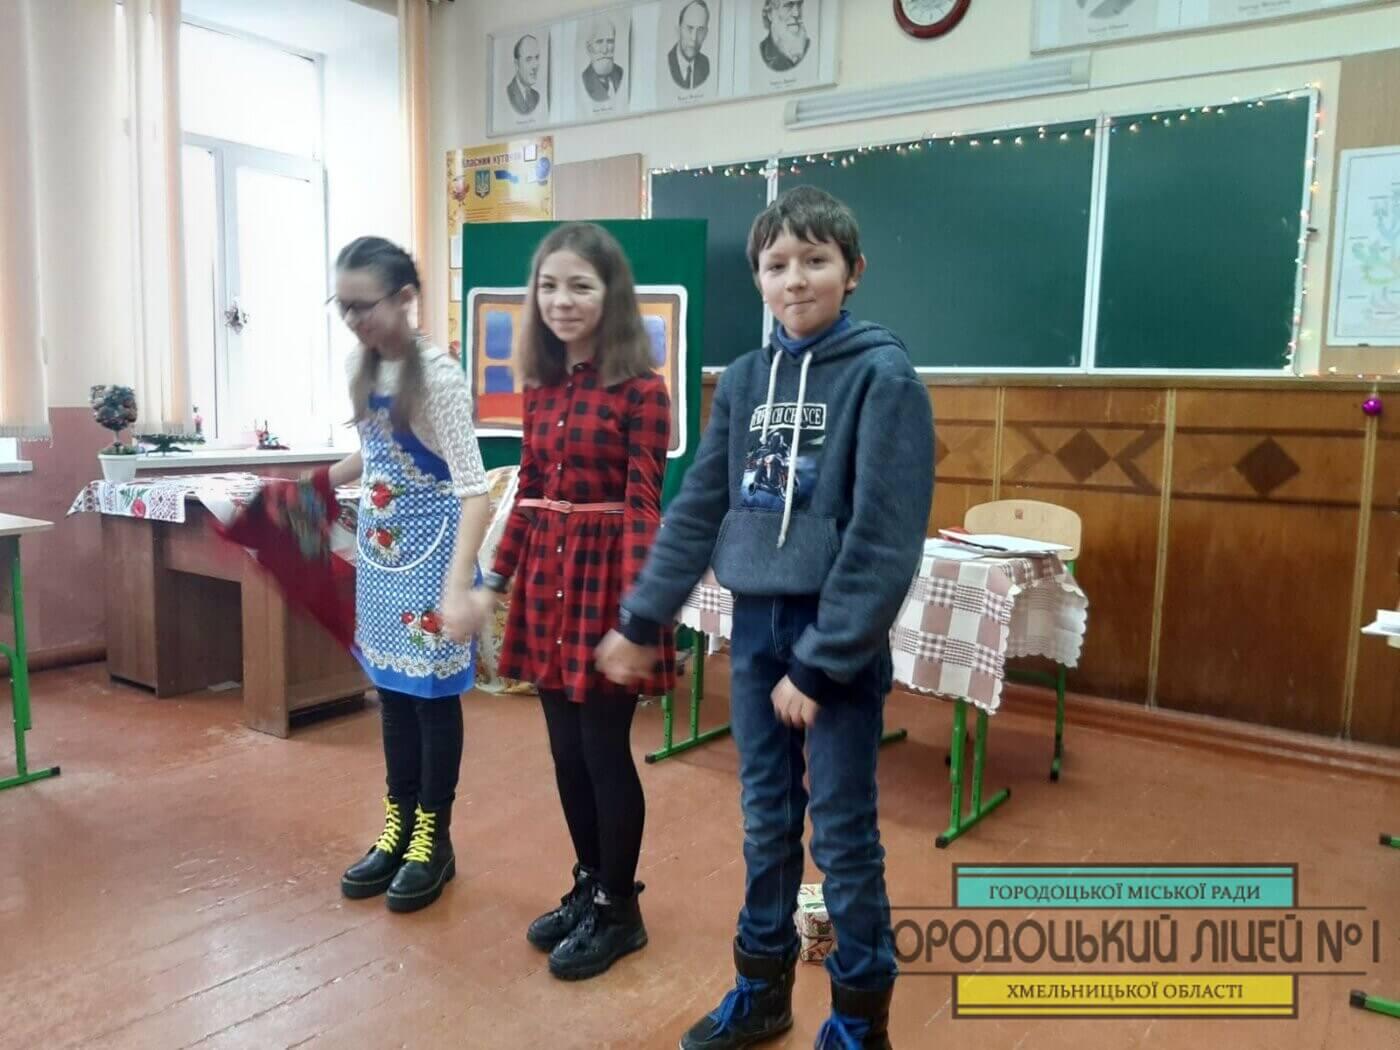 zobrazhennya viber 2020 12 28 21 43 17 1400x1050 - Театральний гурток «Сяйво»